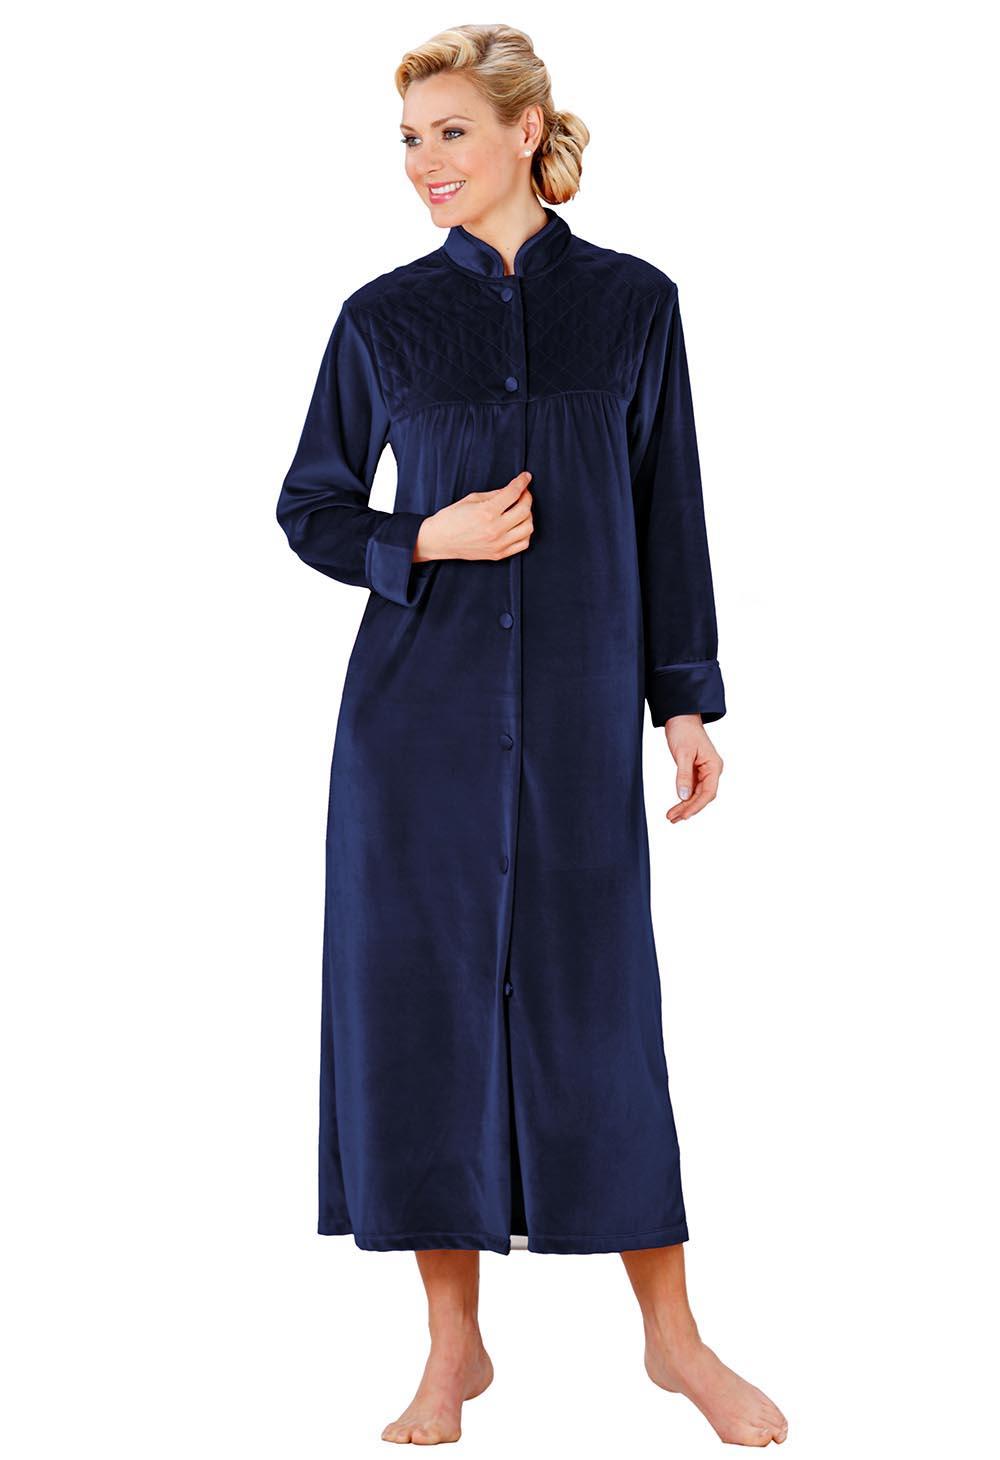 robe de chambre en velours bleu bonheur. Black Bedroom Furniture Sets. Home Design Ideas